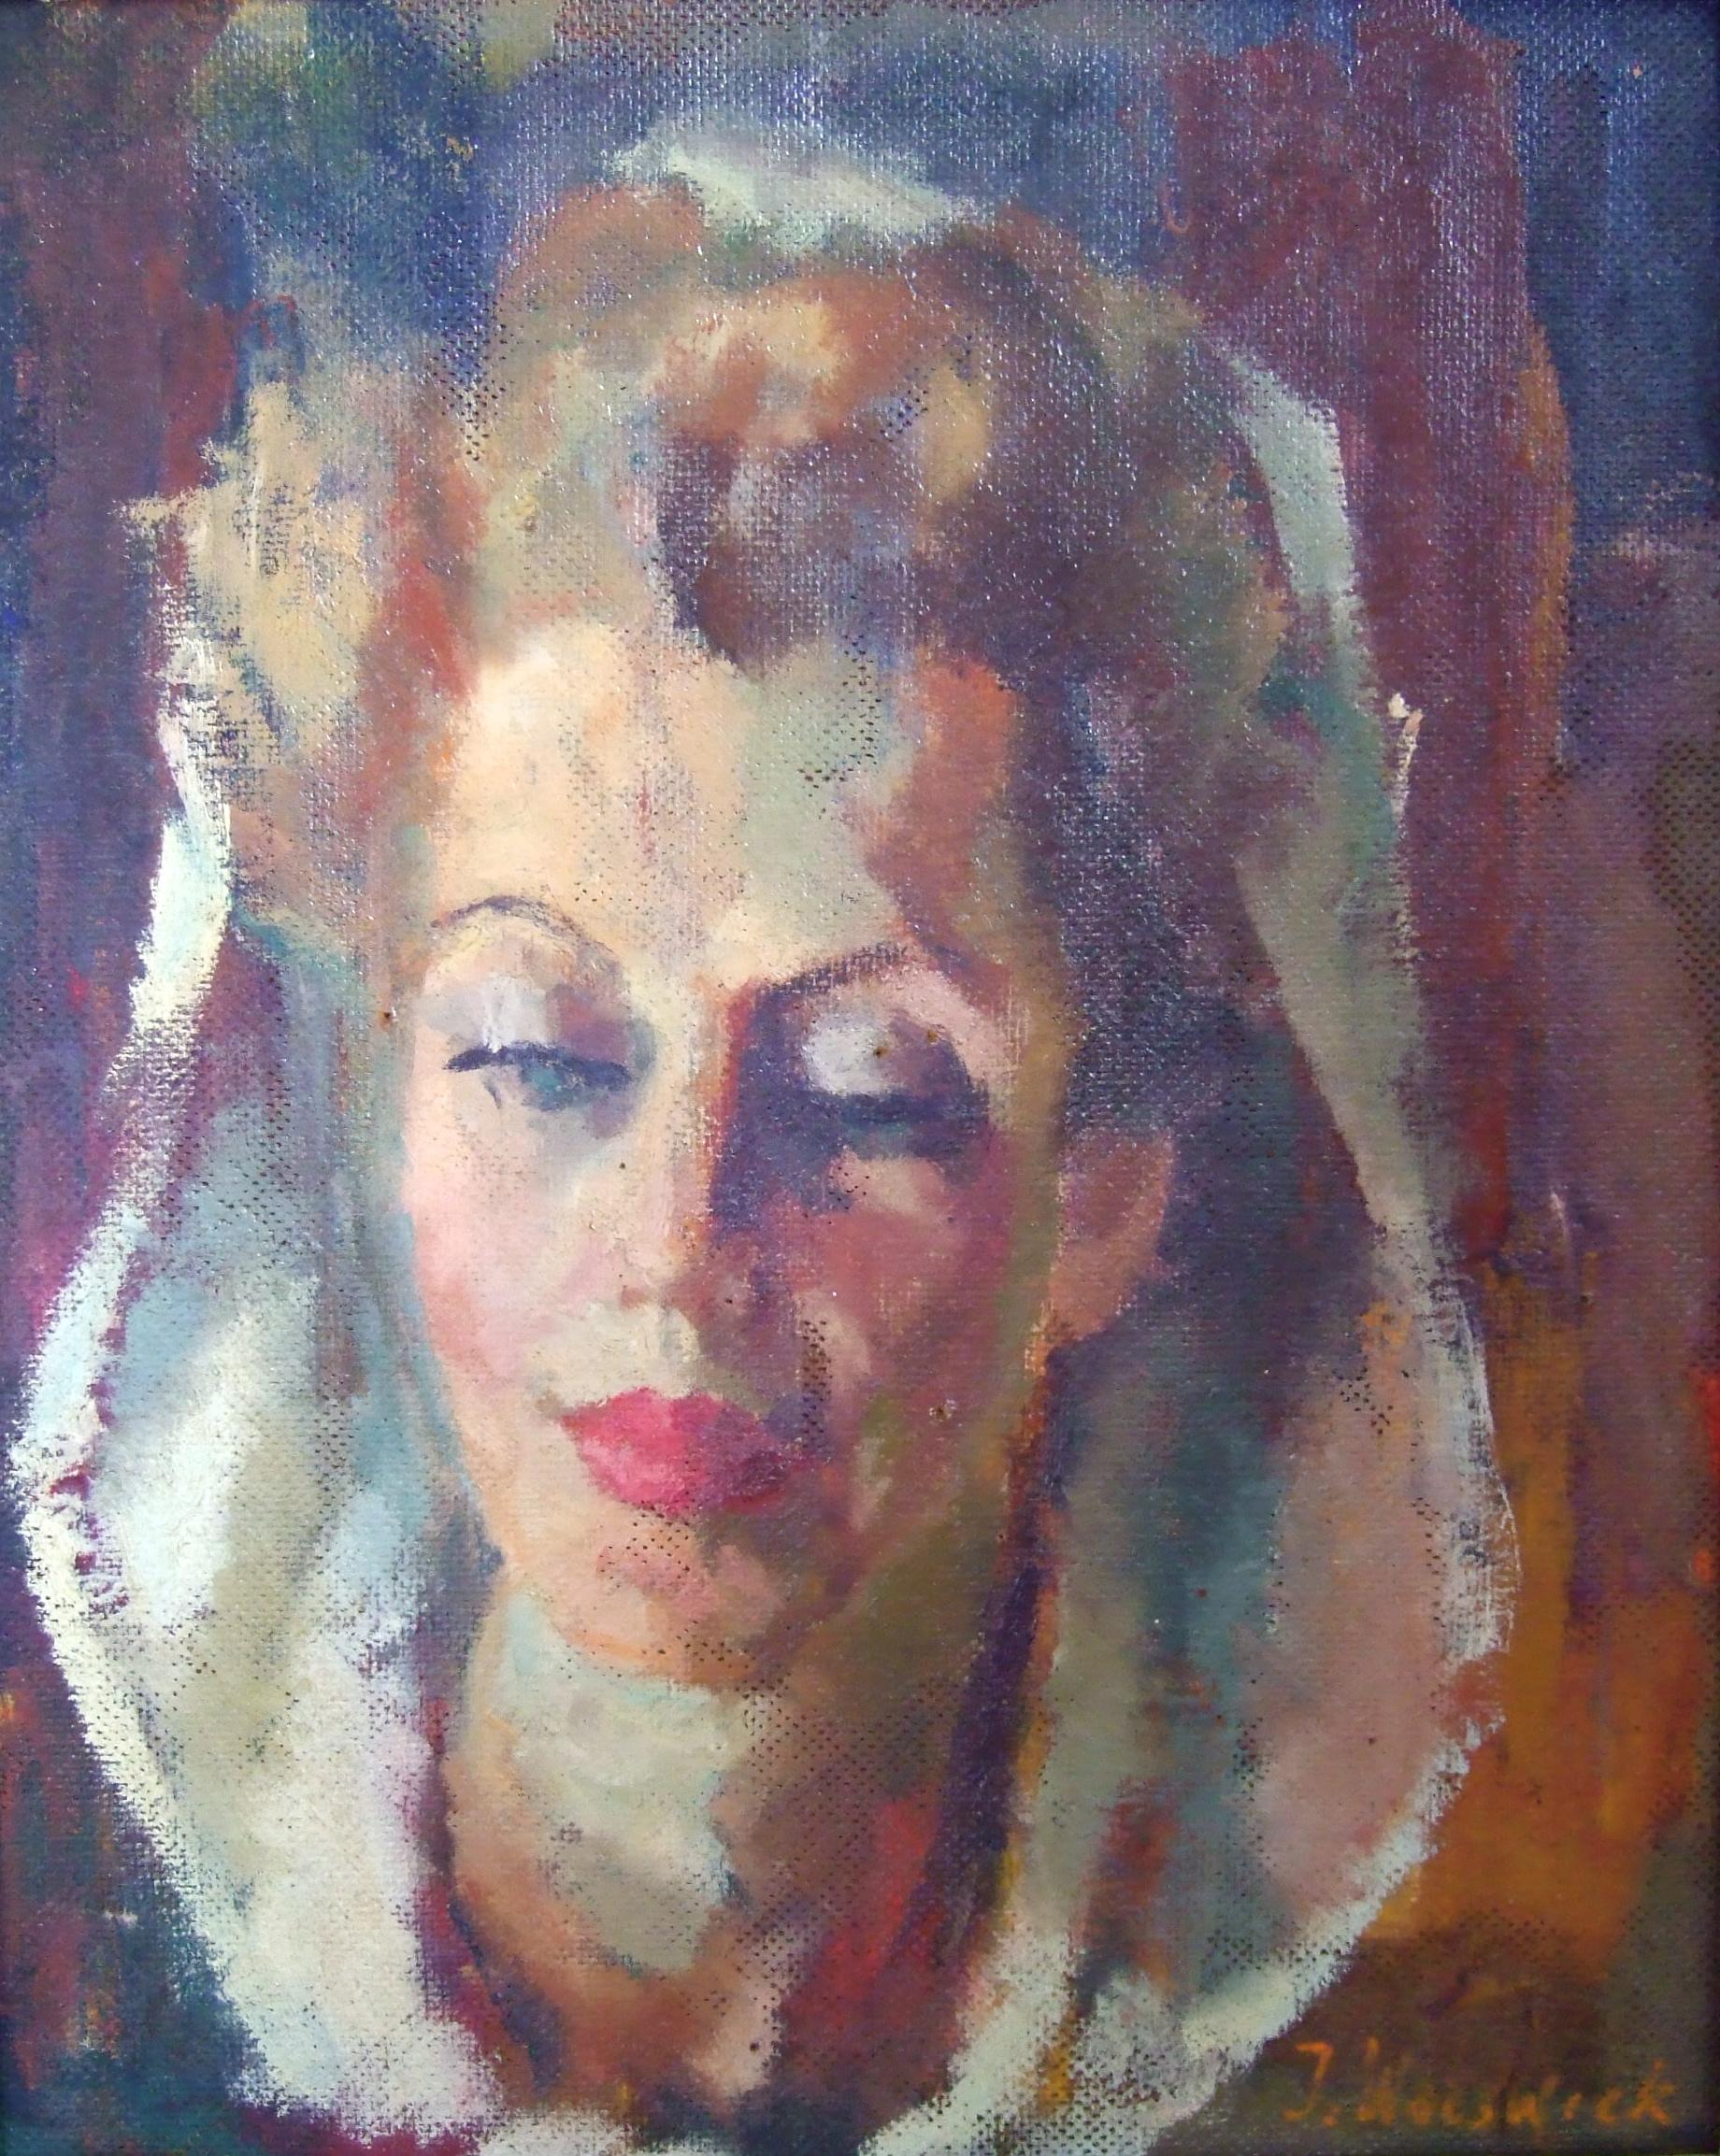 Julia Worswick  Portrait of a lady. Oil on board, signed. Size: 41 x 33 cm.